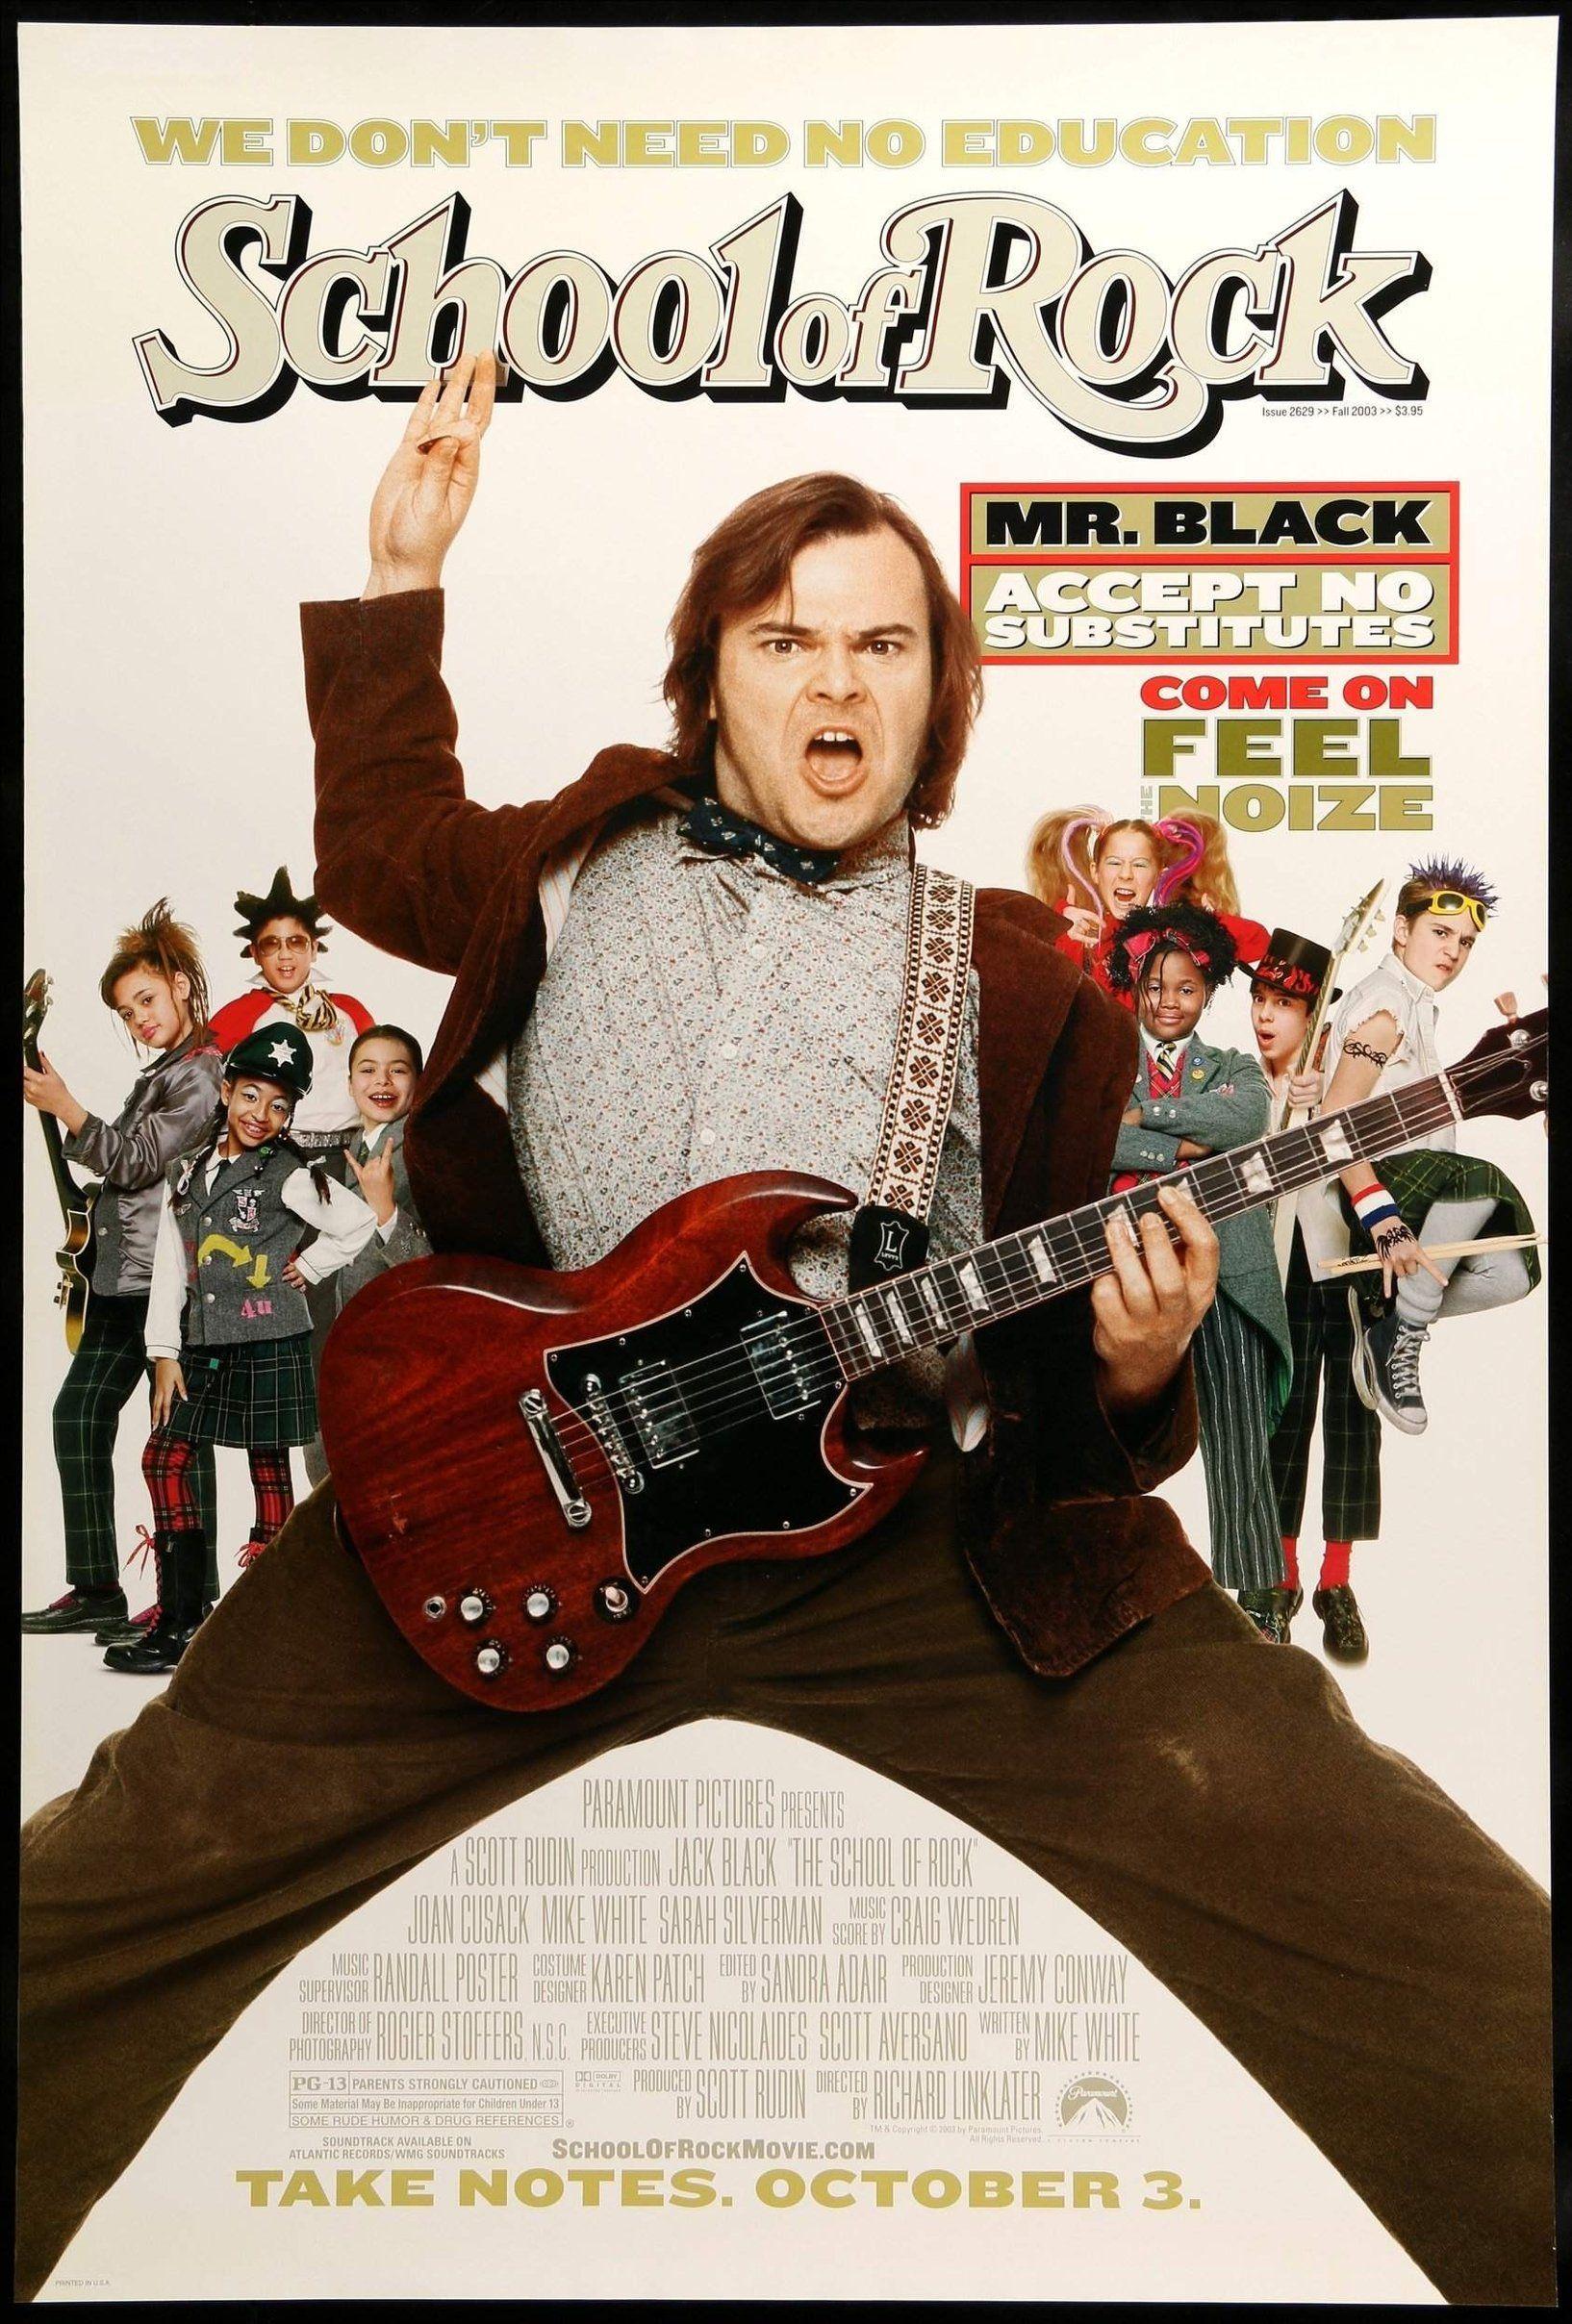 School of Rock (2003) | School of rock, Jack black, Movie posters